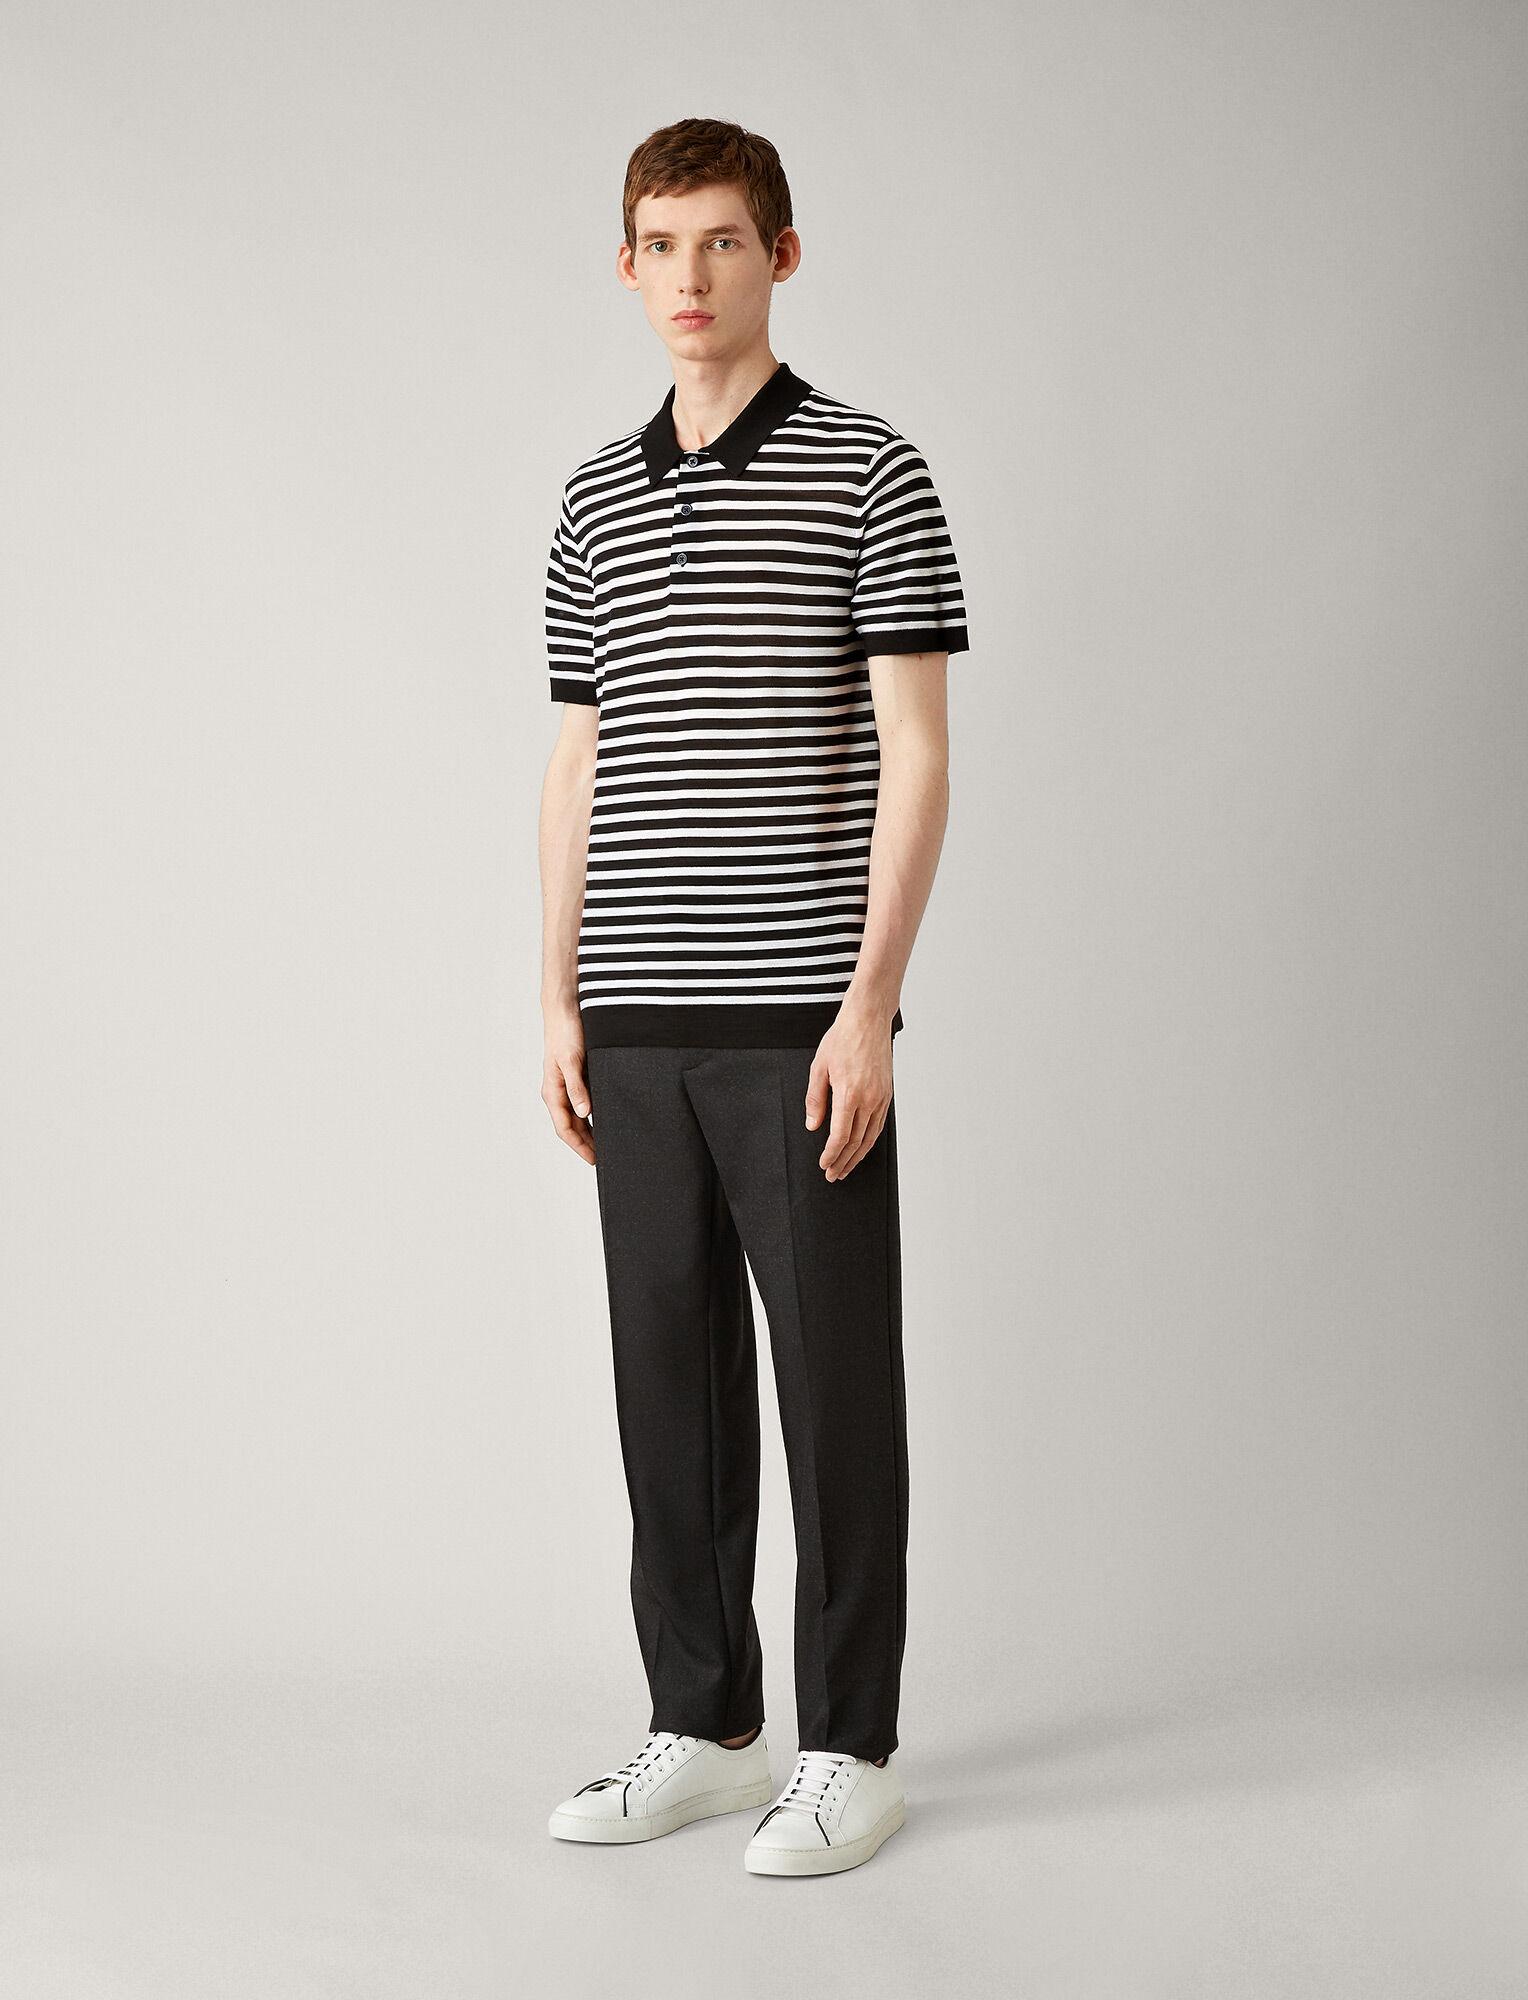 Joseph, Polo Light Stripe Merinos Knit, in BLACK